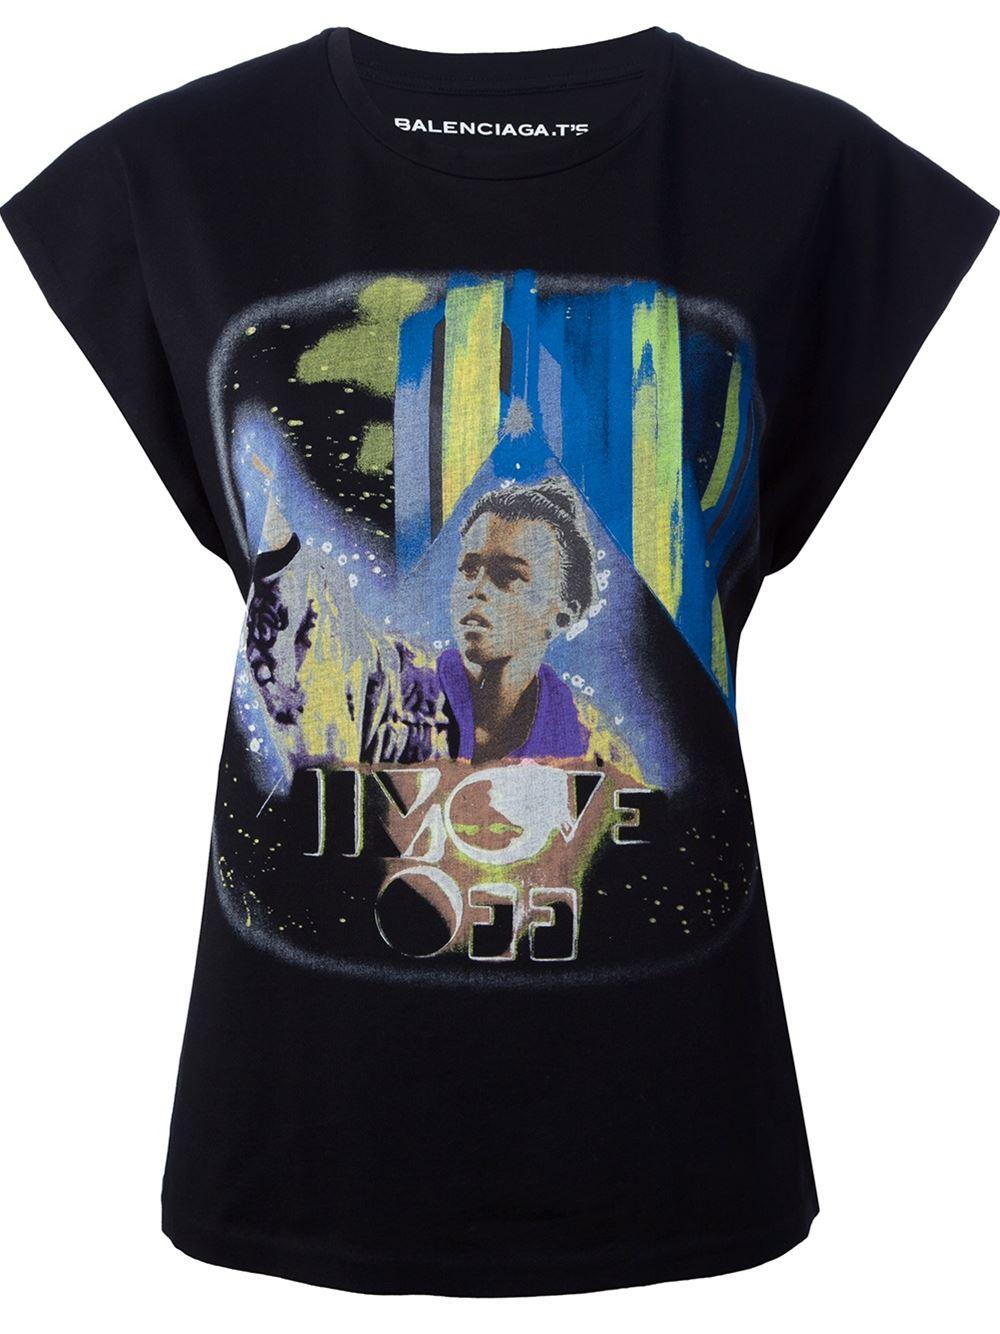 896cf51e7fb1 Balenciaga Printed T-shirt - - Farfetch.com